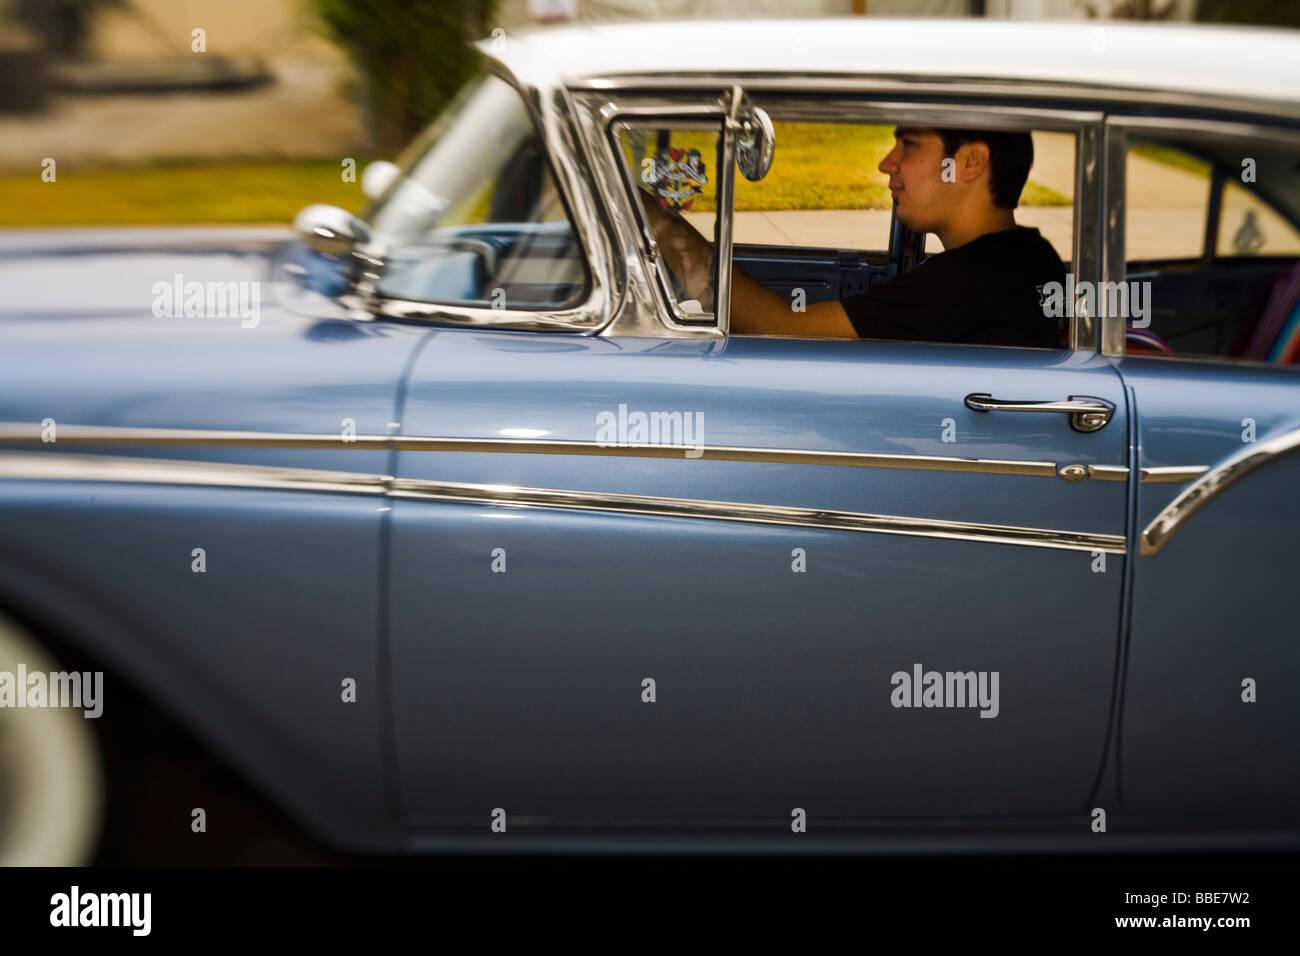 Driving A Classic Car At The Parade Culver City Car Show Culver